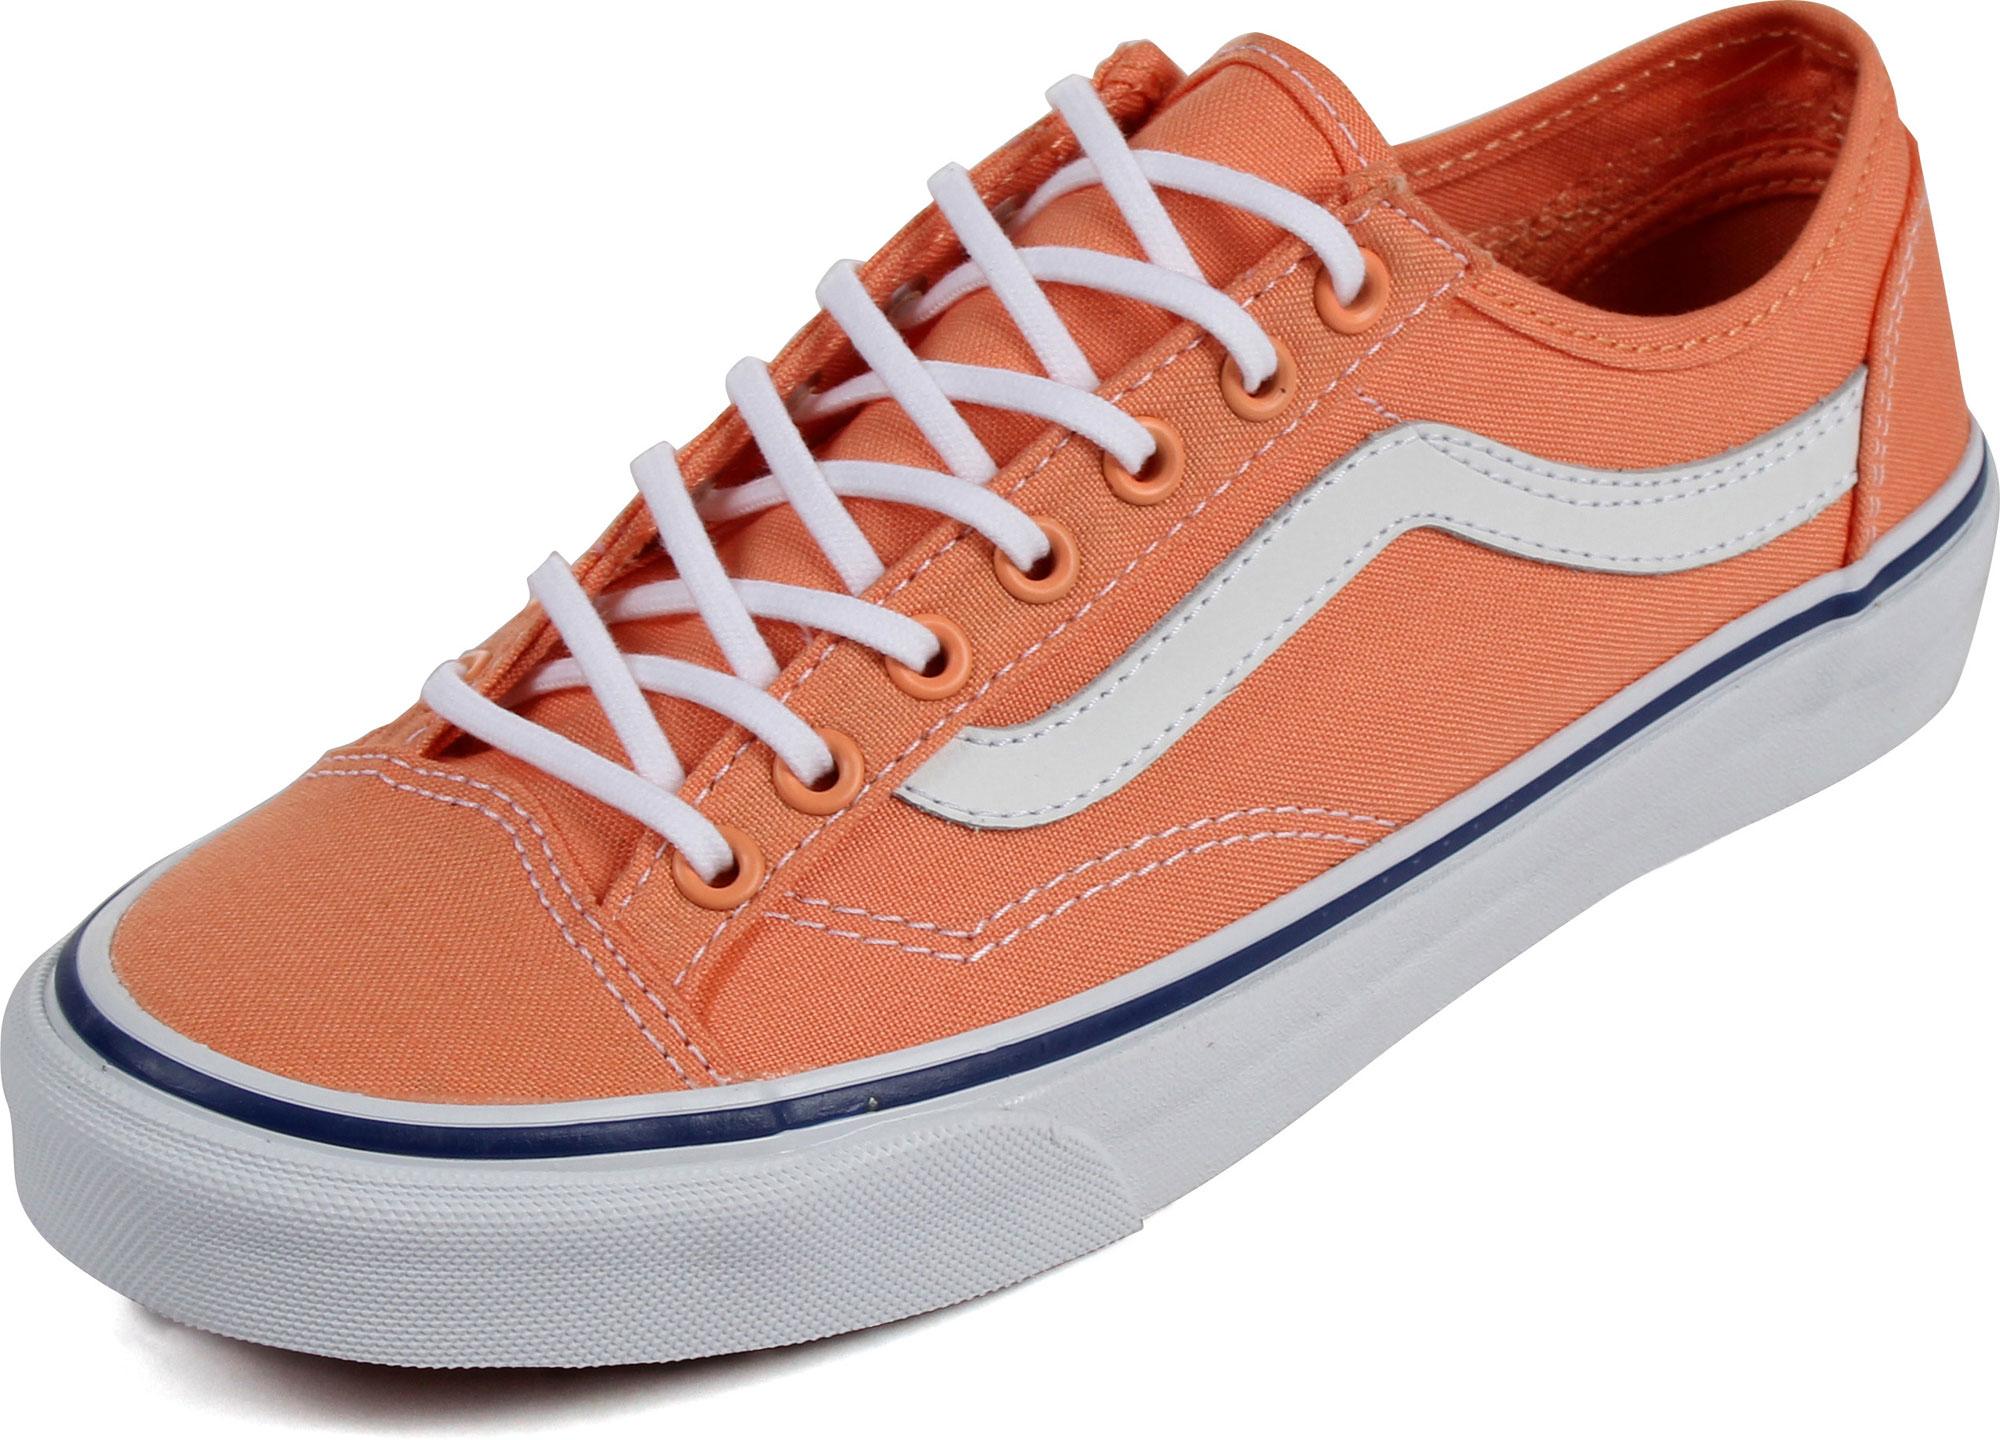 684a099fe821 Vans - Womens Style 36 Slim Shoes